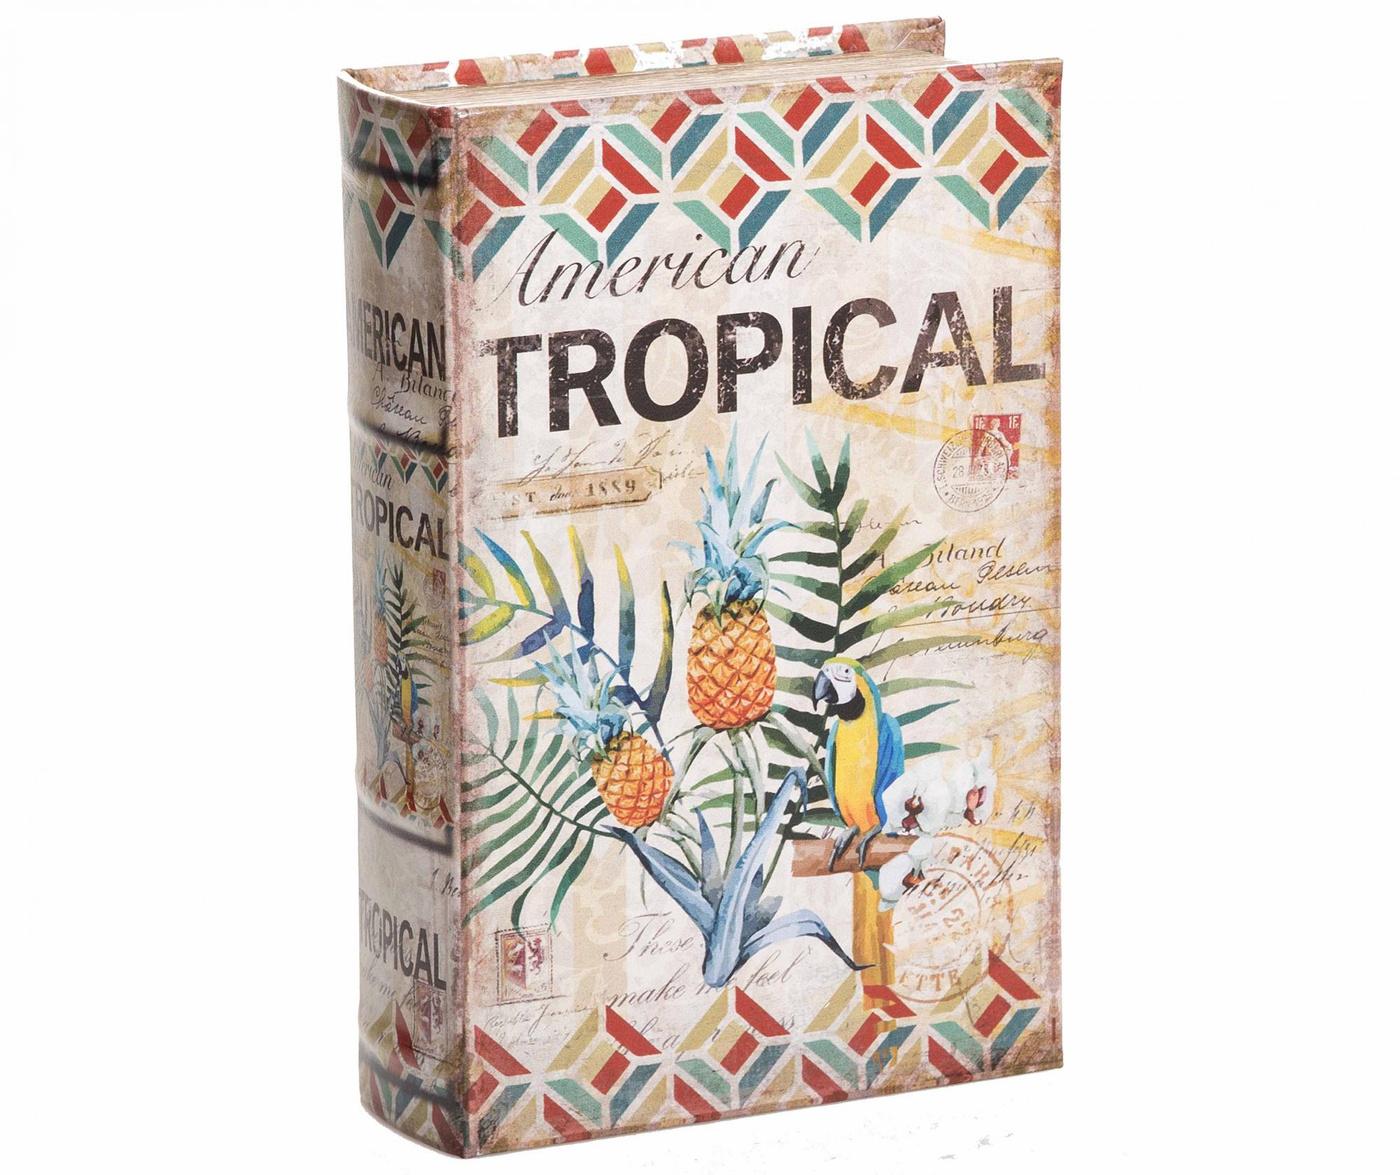 American Tropical Könyvdoboz